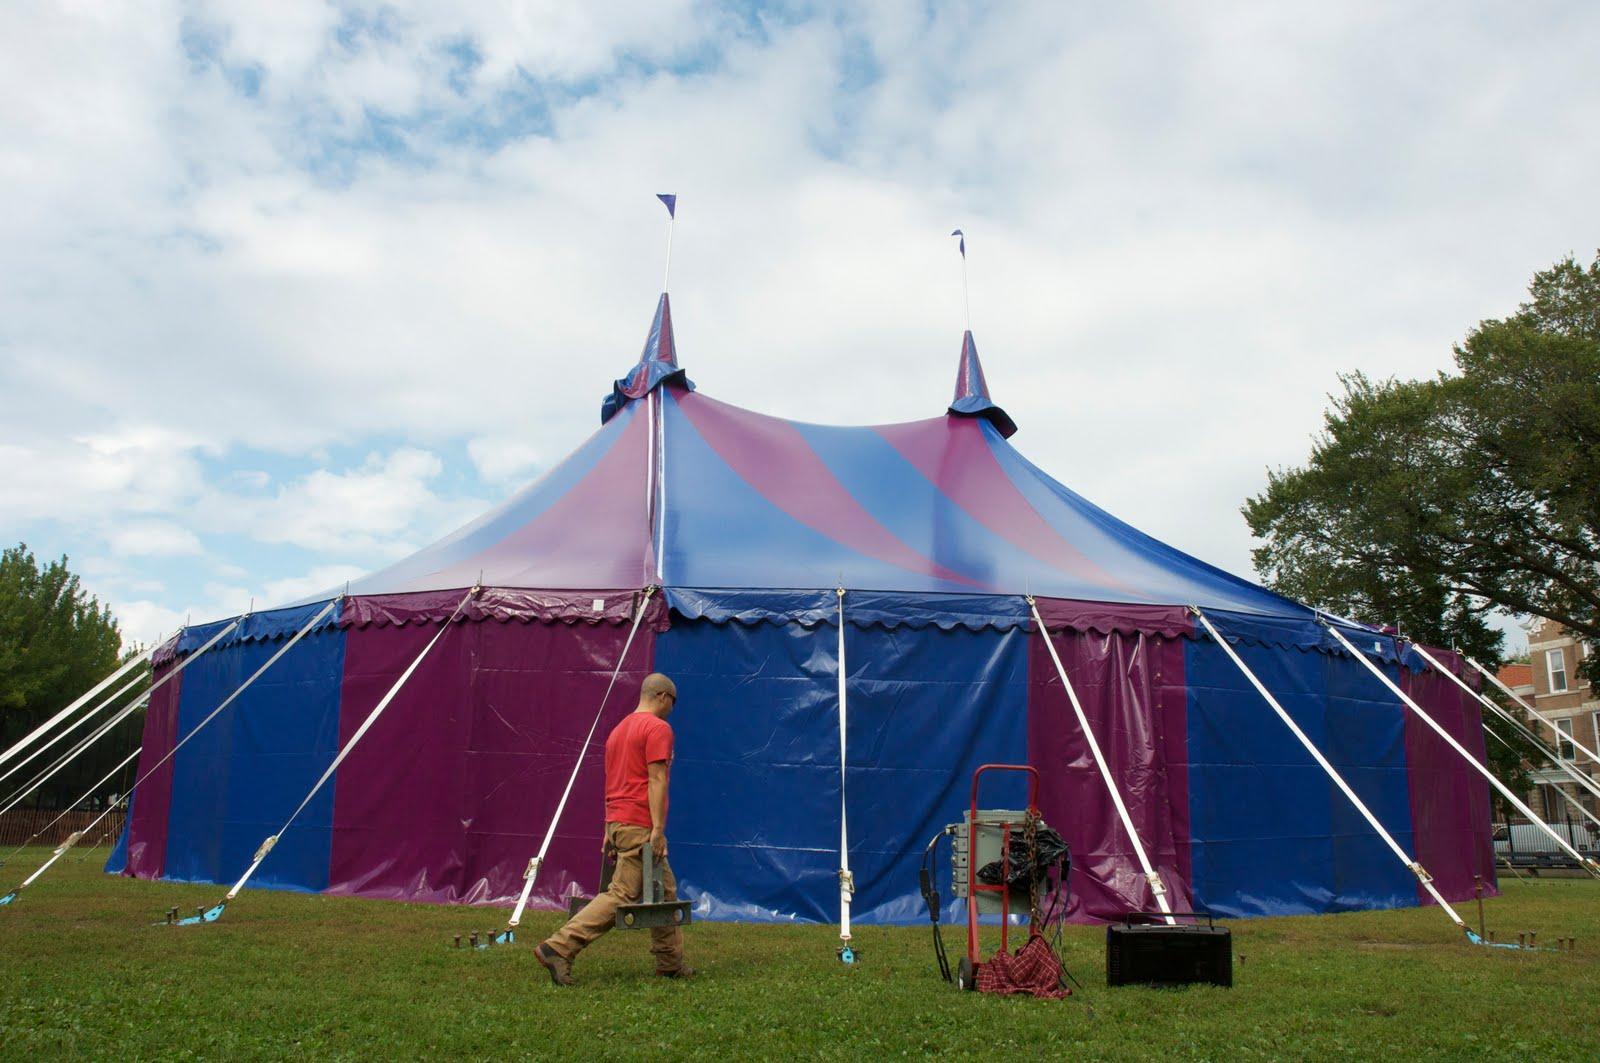 Circus Tent for Midnight Circus & Circus Tent for Midnight Circus | Armbruster Tent Maker